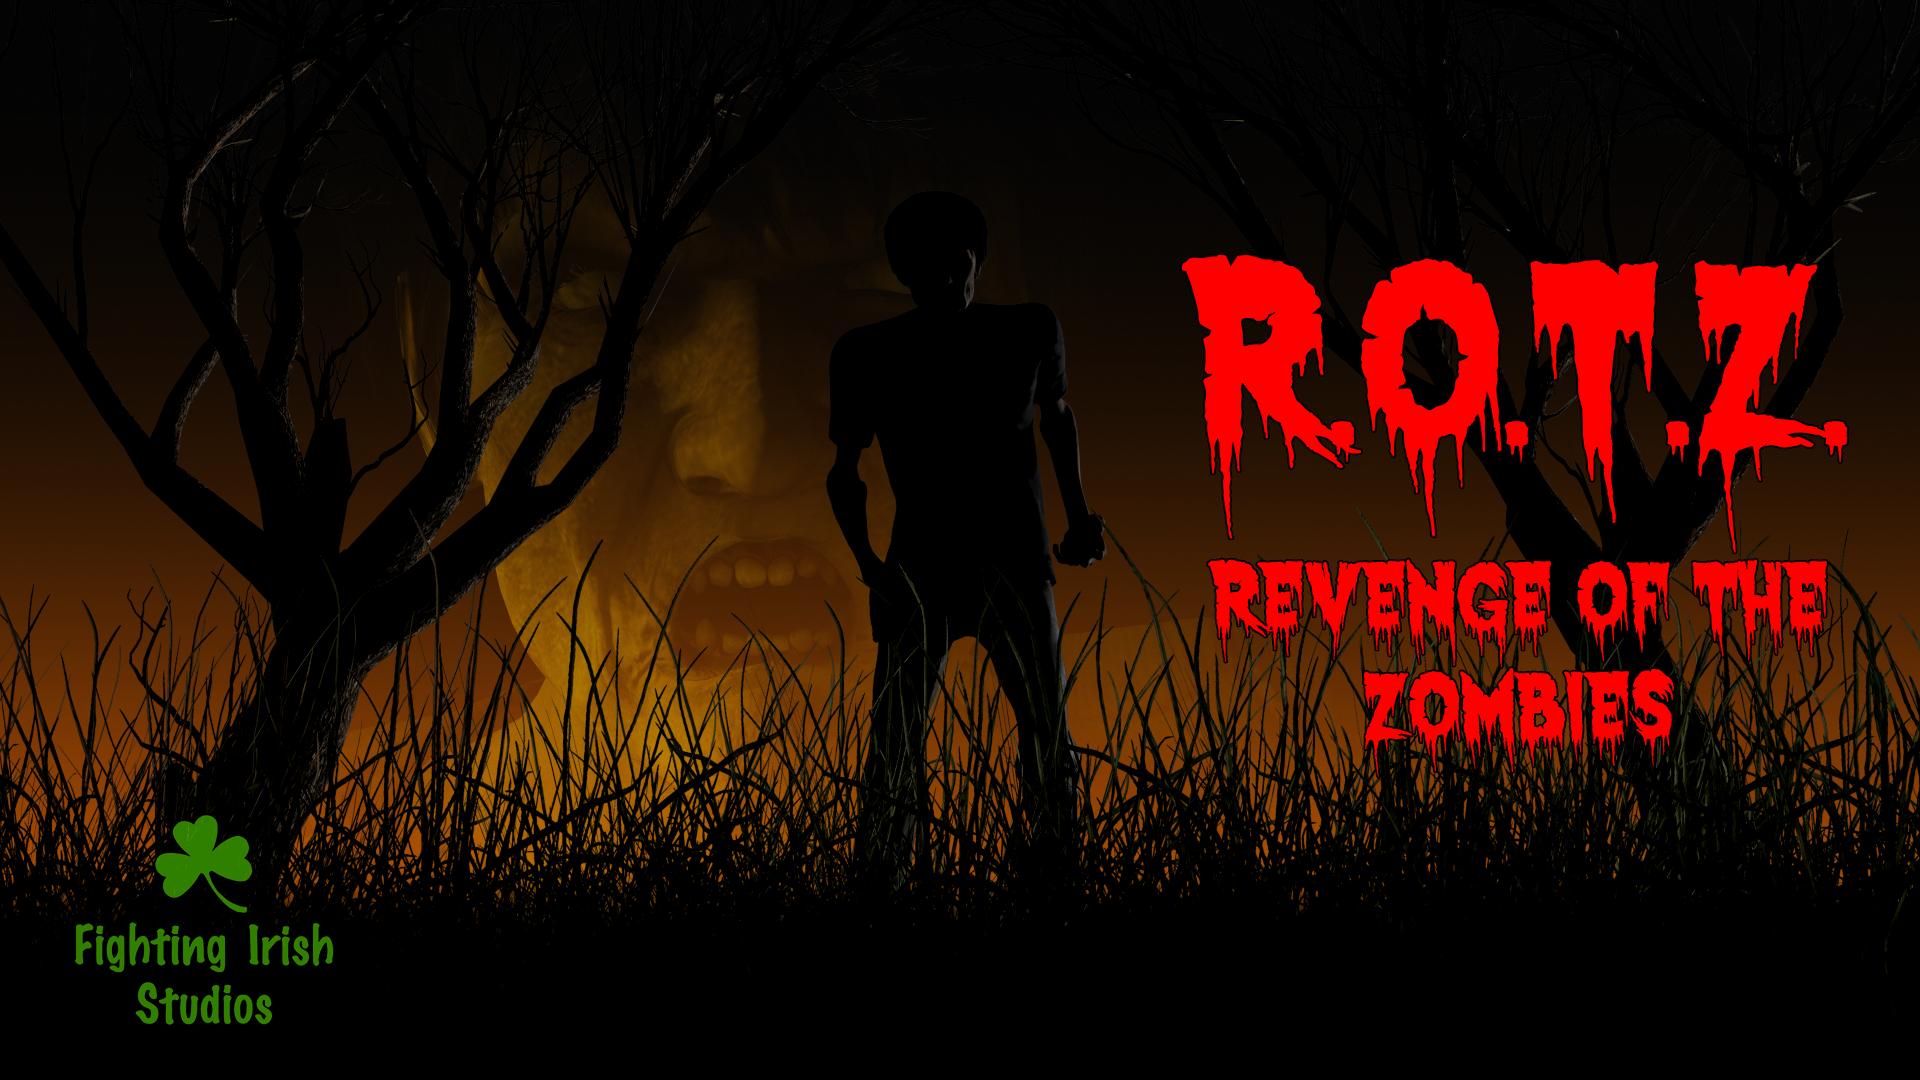 ROTZ: Revenge of the Zombies by Fighting Irish Studios